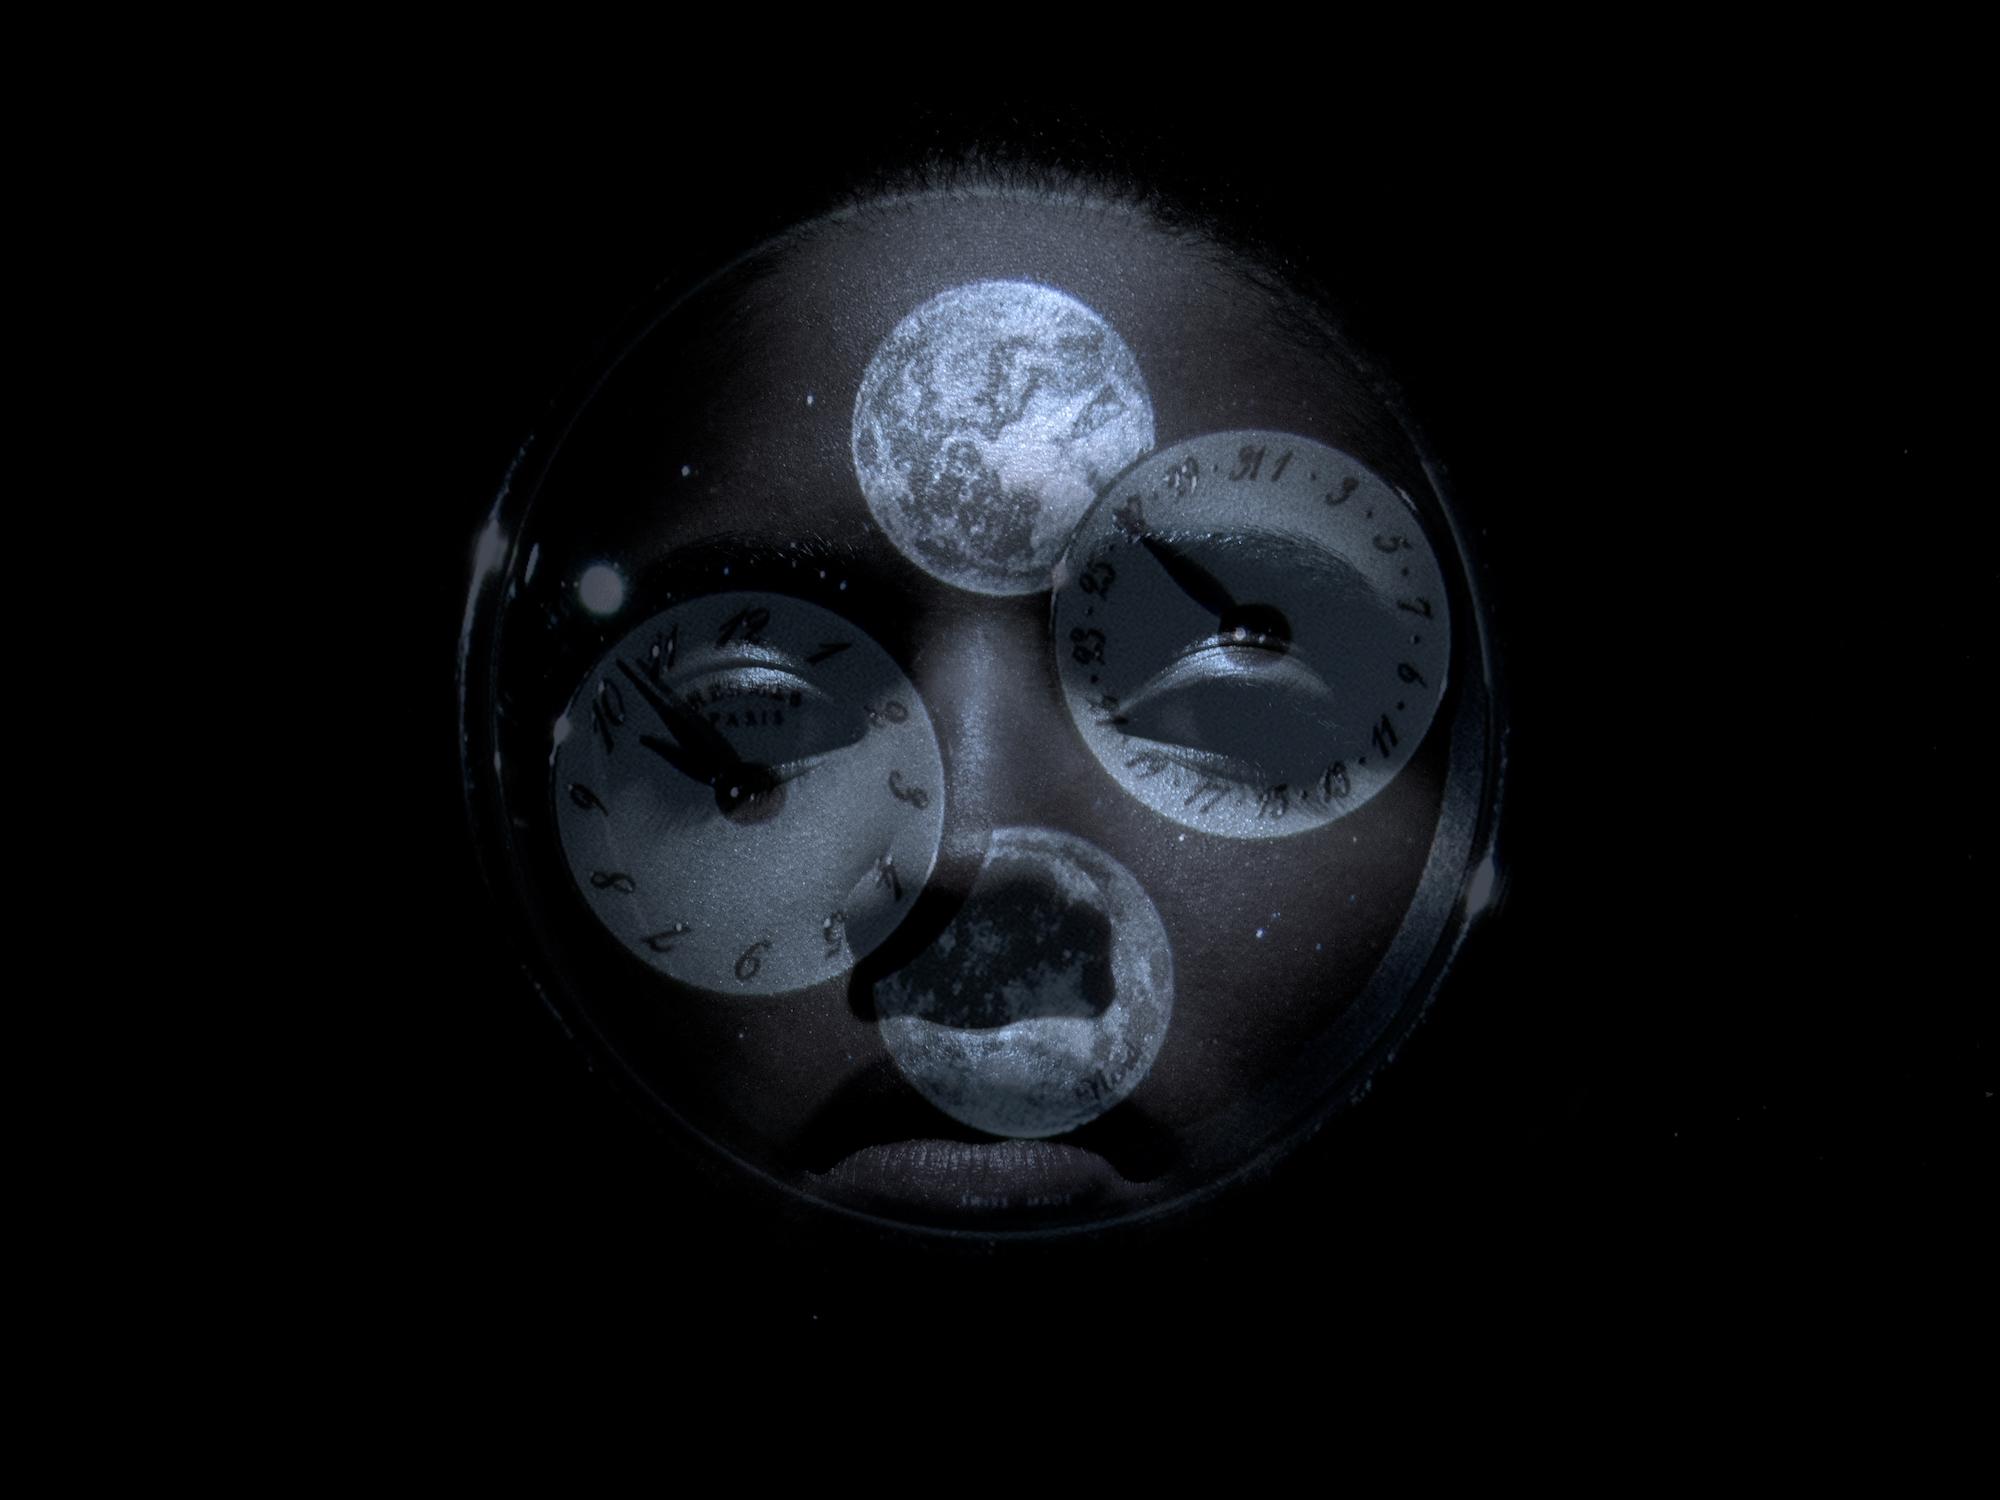 Arceau l'Heure de la Lune, Hermès Horloger ©Buonomo & Cometti